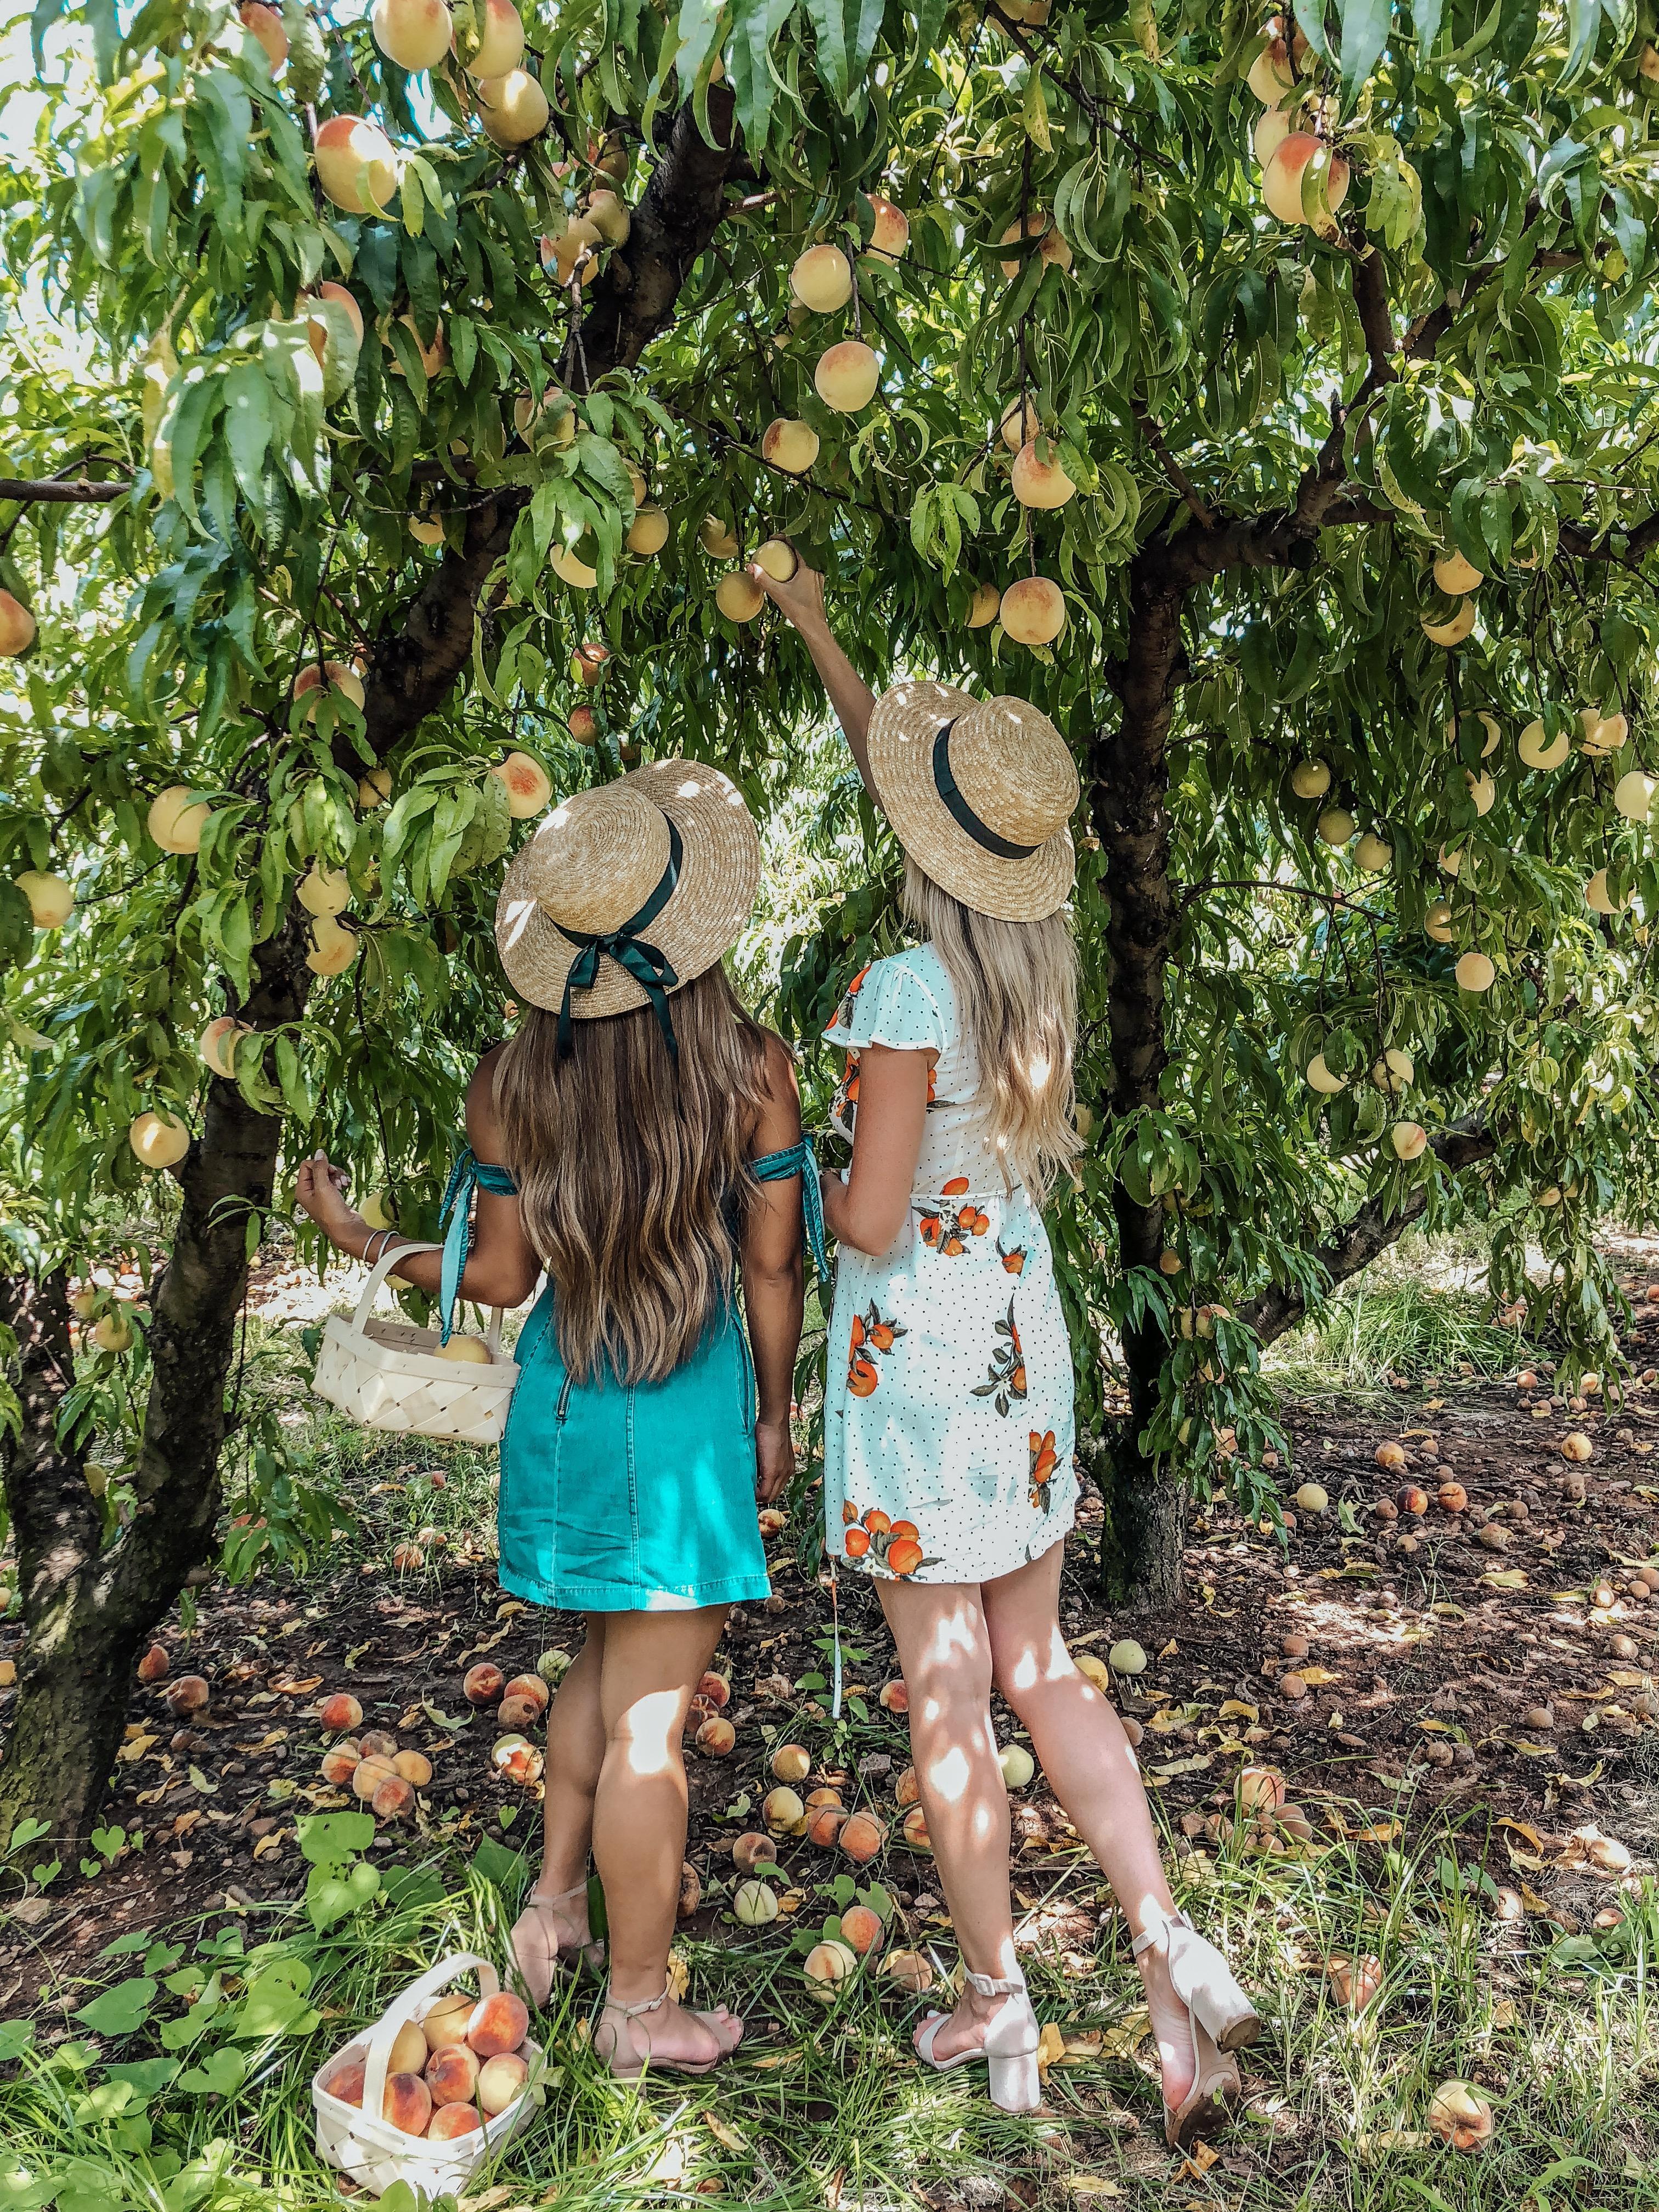 Peach Picking at Jaemor Farms